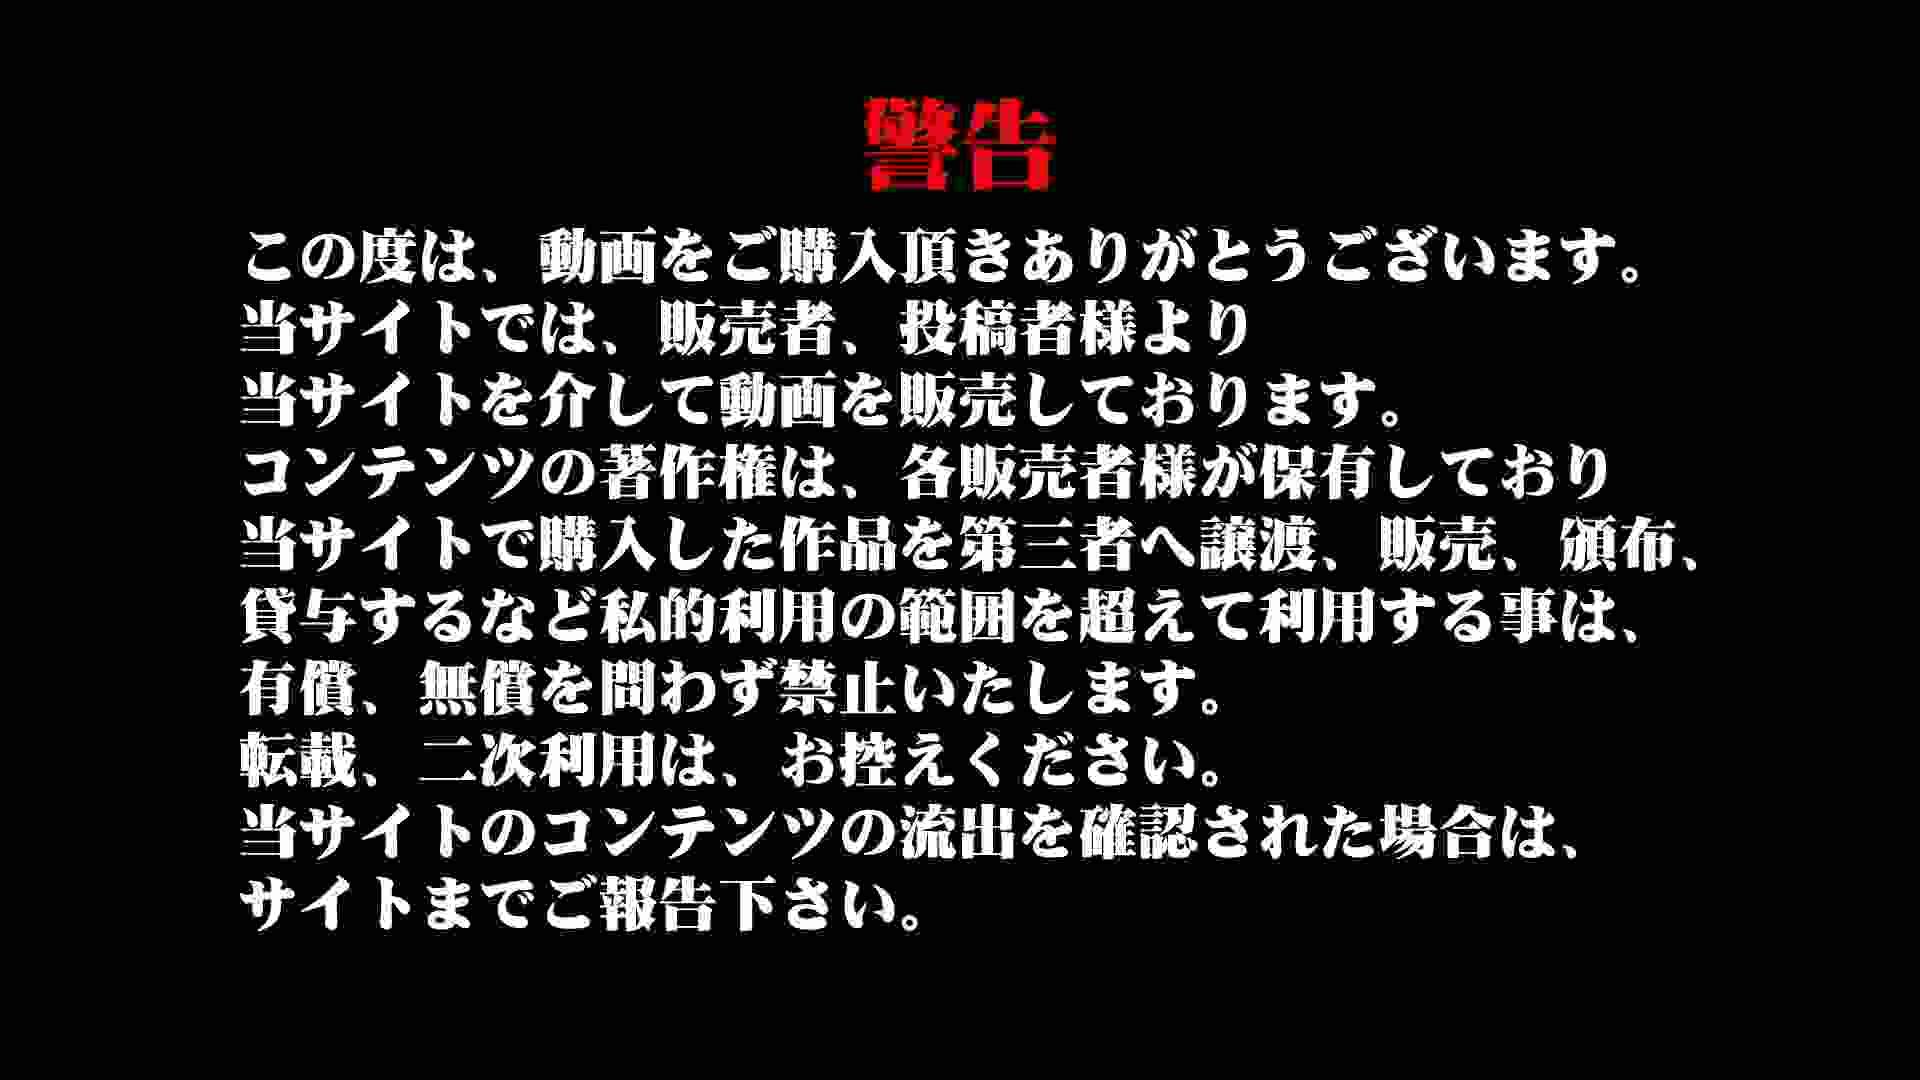 Aquaな露天風呂Vol.894 盗撮シリーズ | 露天風呂編  85PIX 1